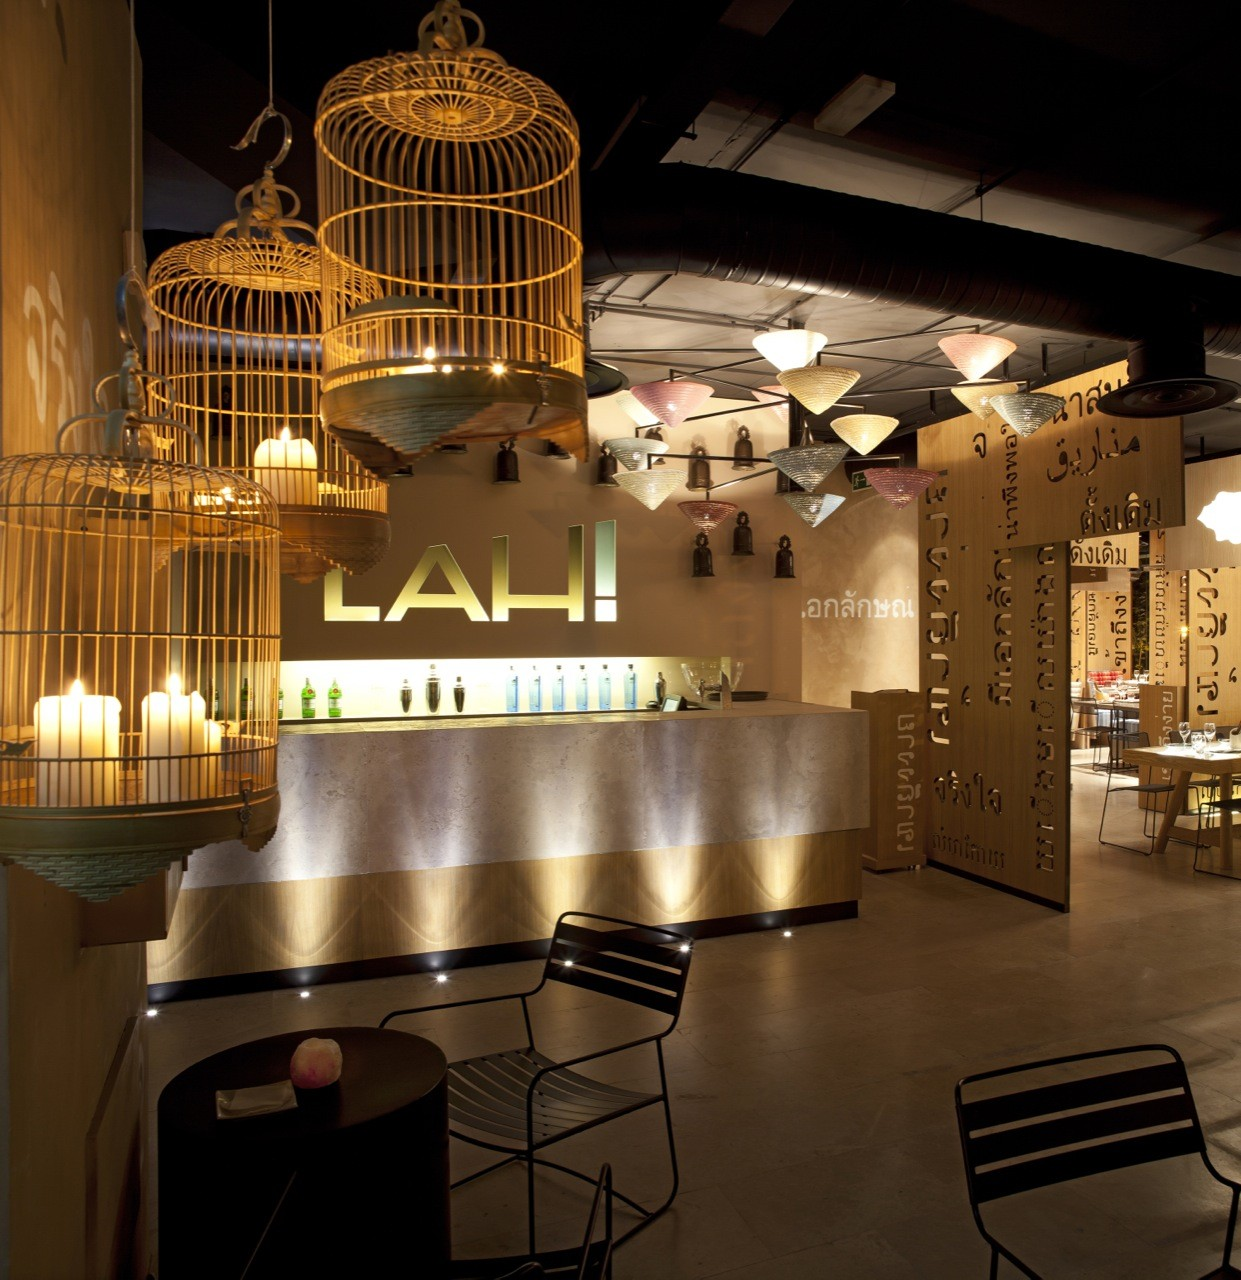 LAH! Restaurant / IlmioDesign, © Usio Davila